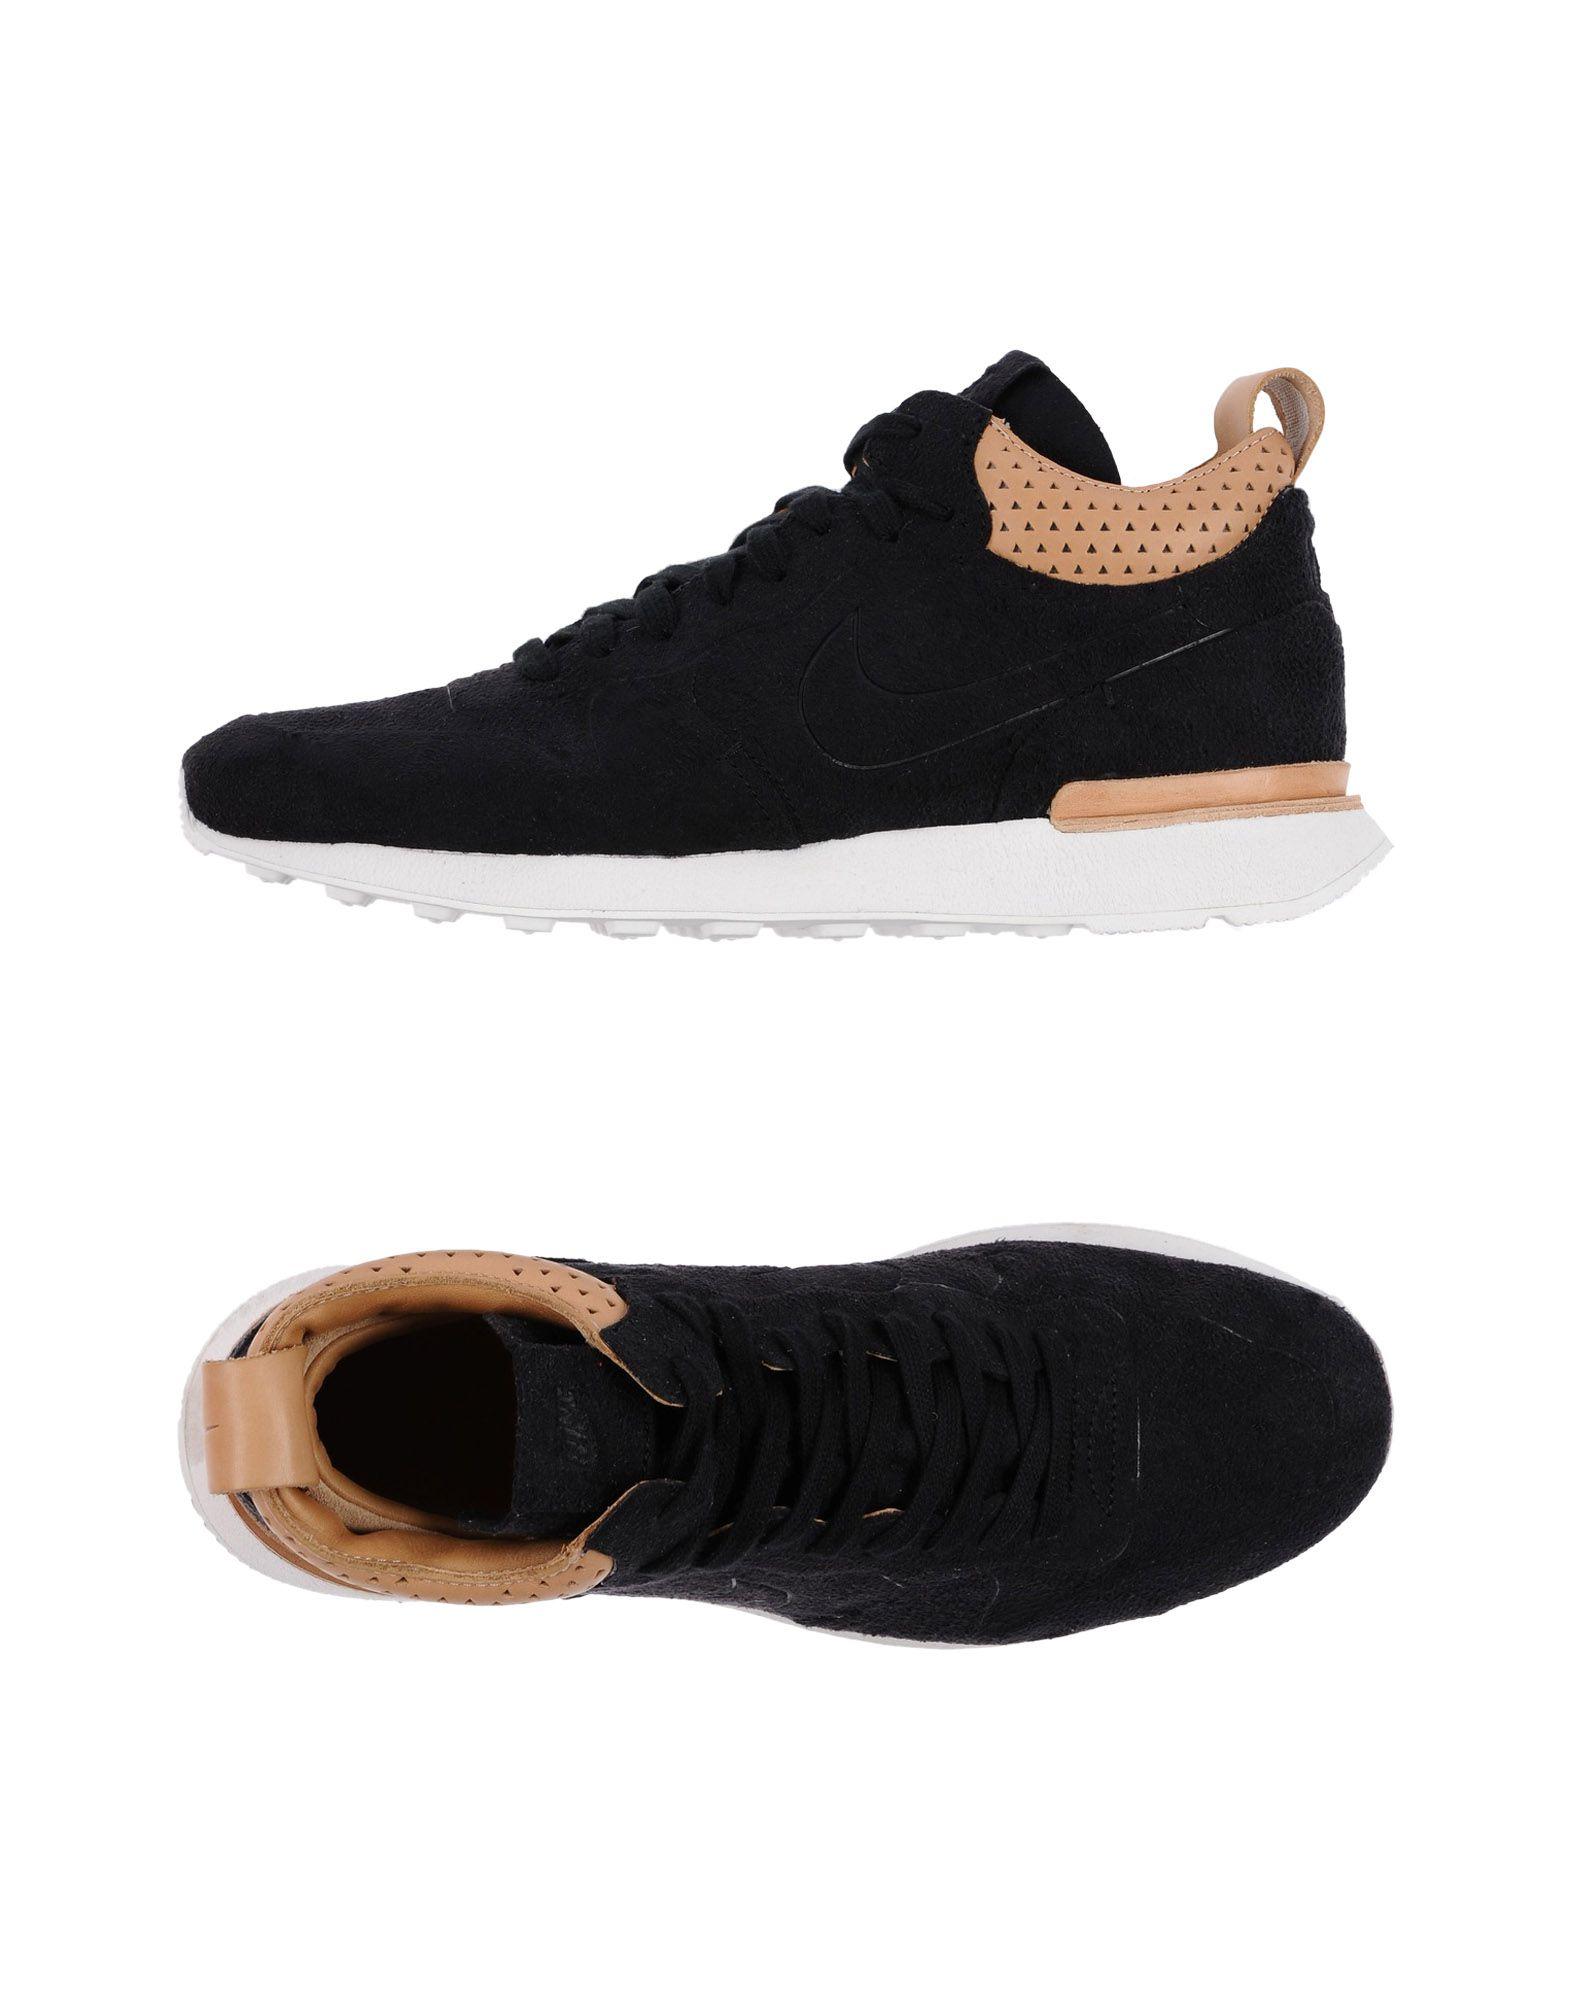 Haltbare Mode billige Schuhe Nike Sneakers Herren  11246845PG Heiße Schuhe